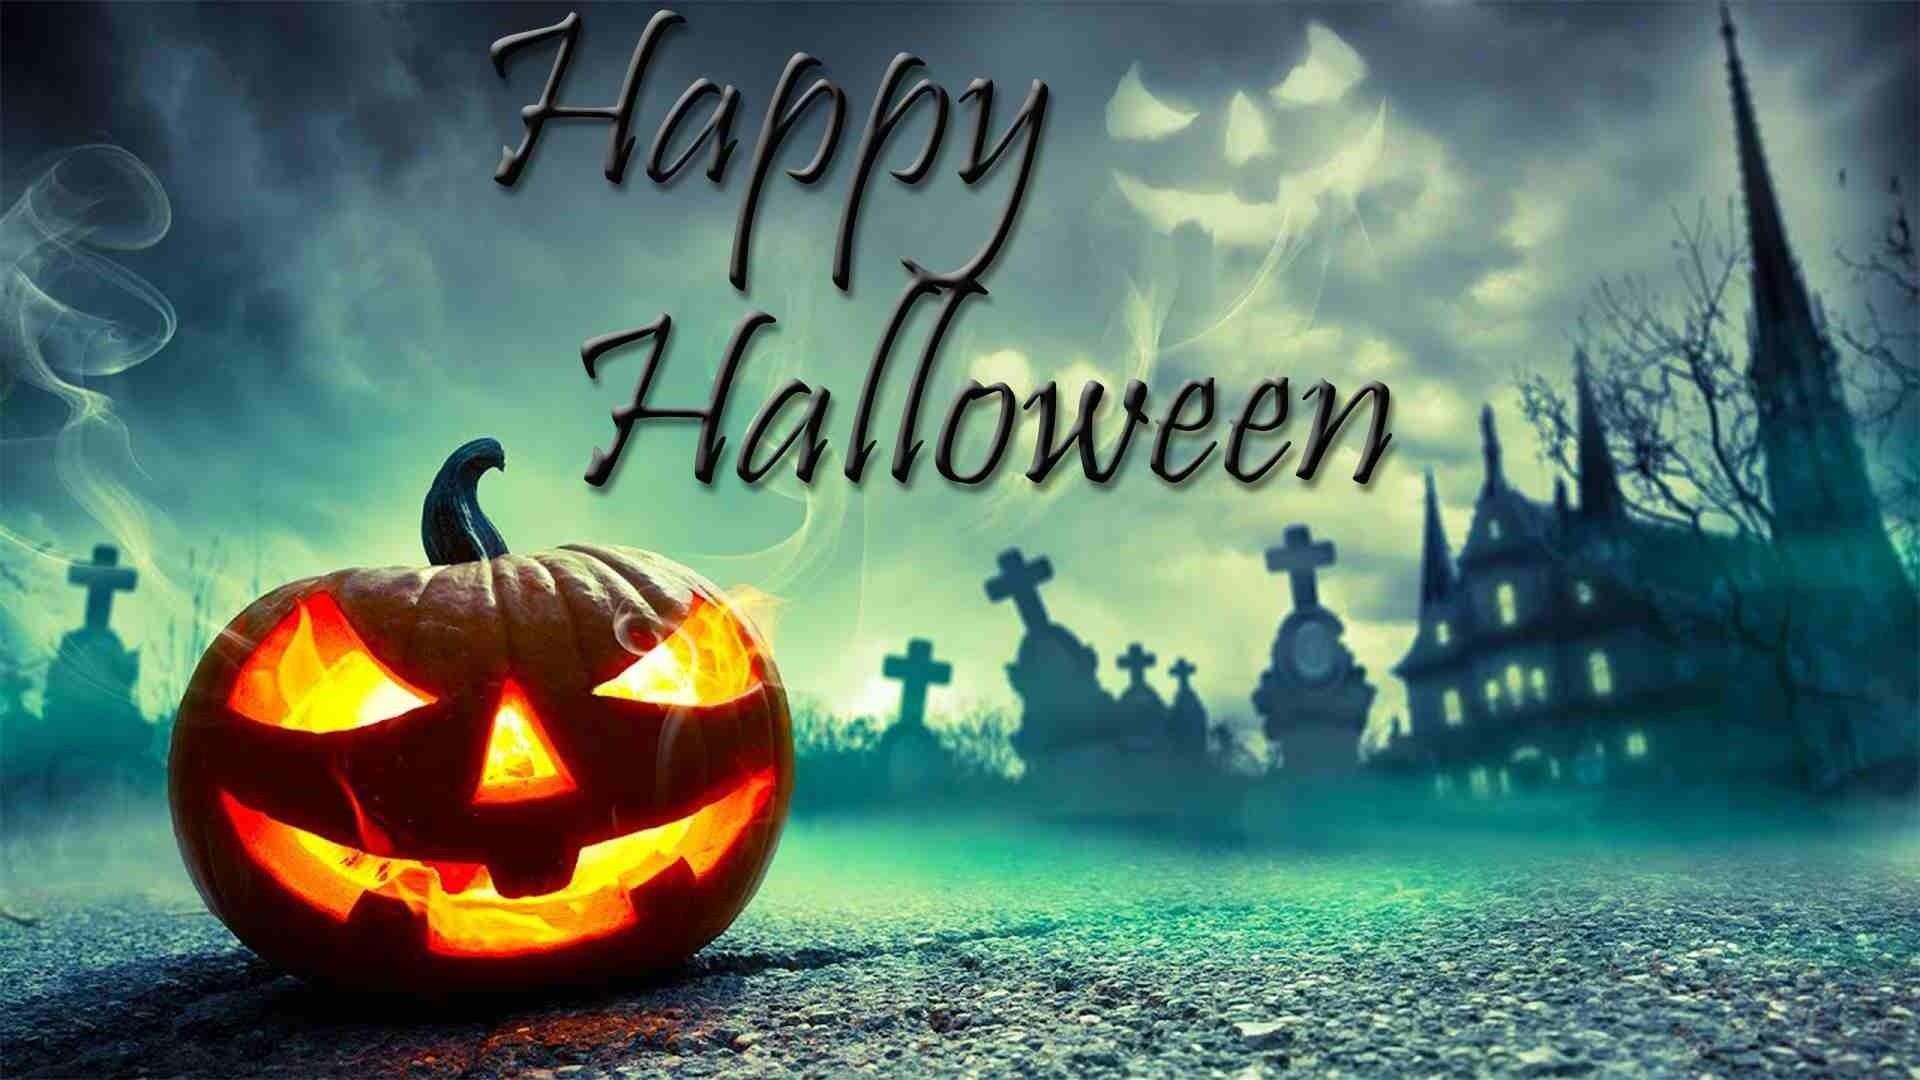 Halloween Greeting Card Image